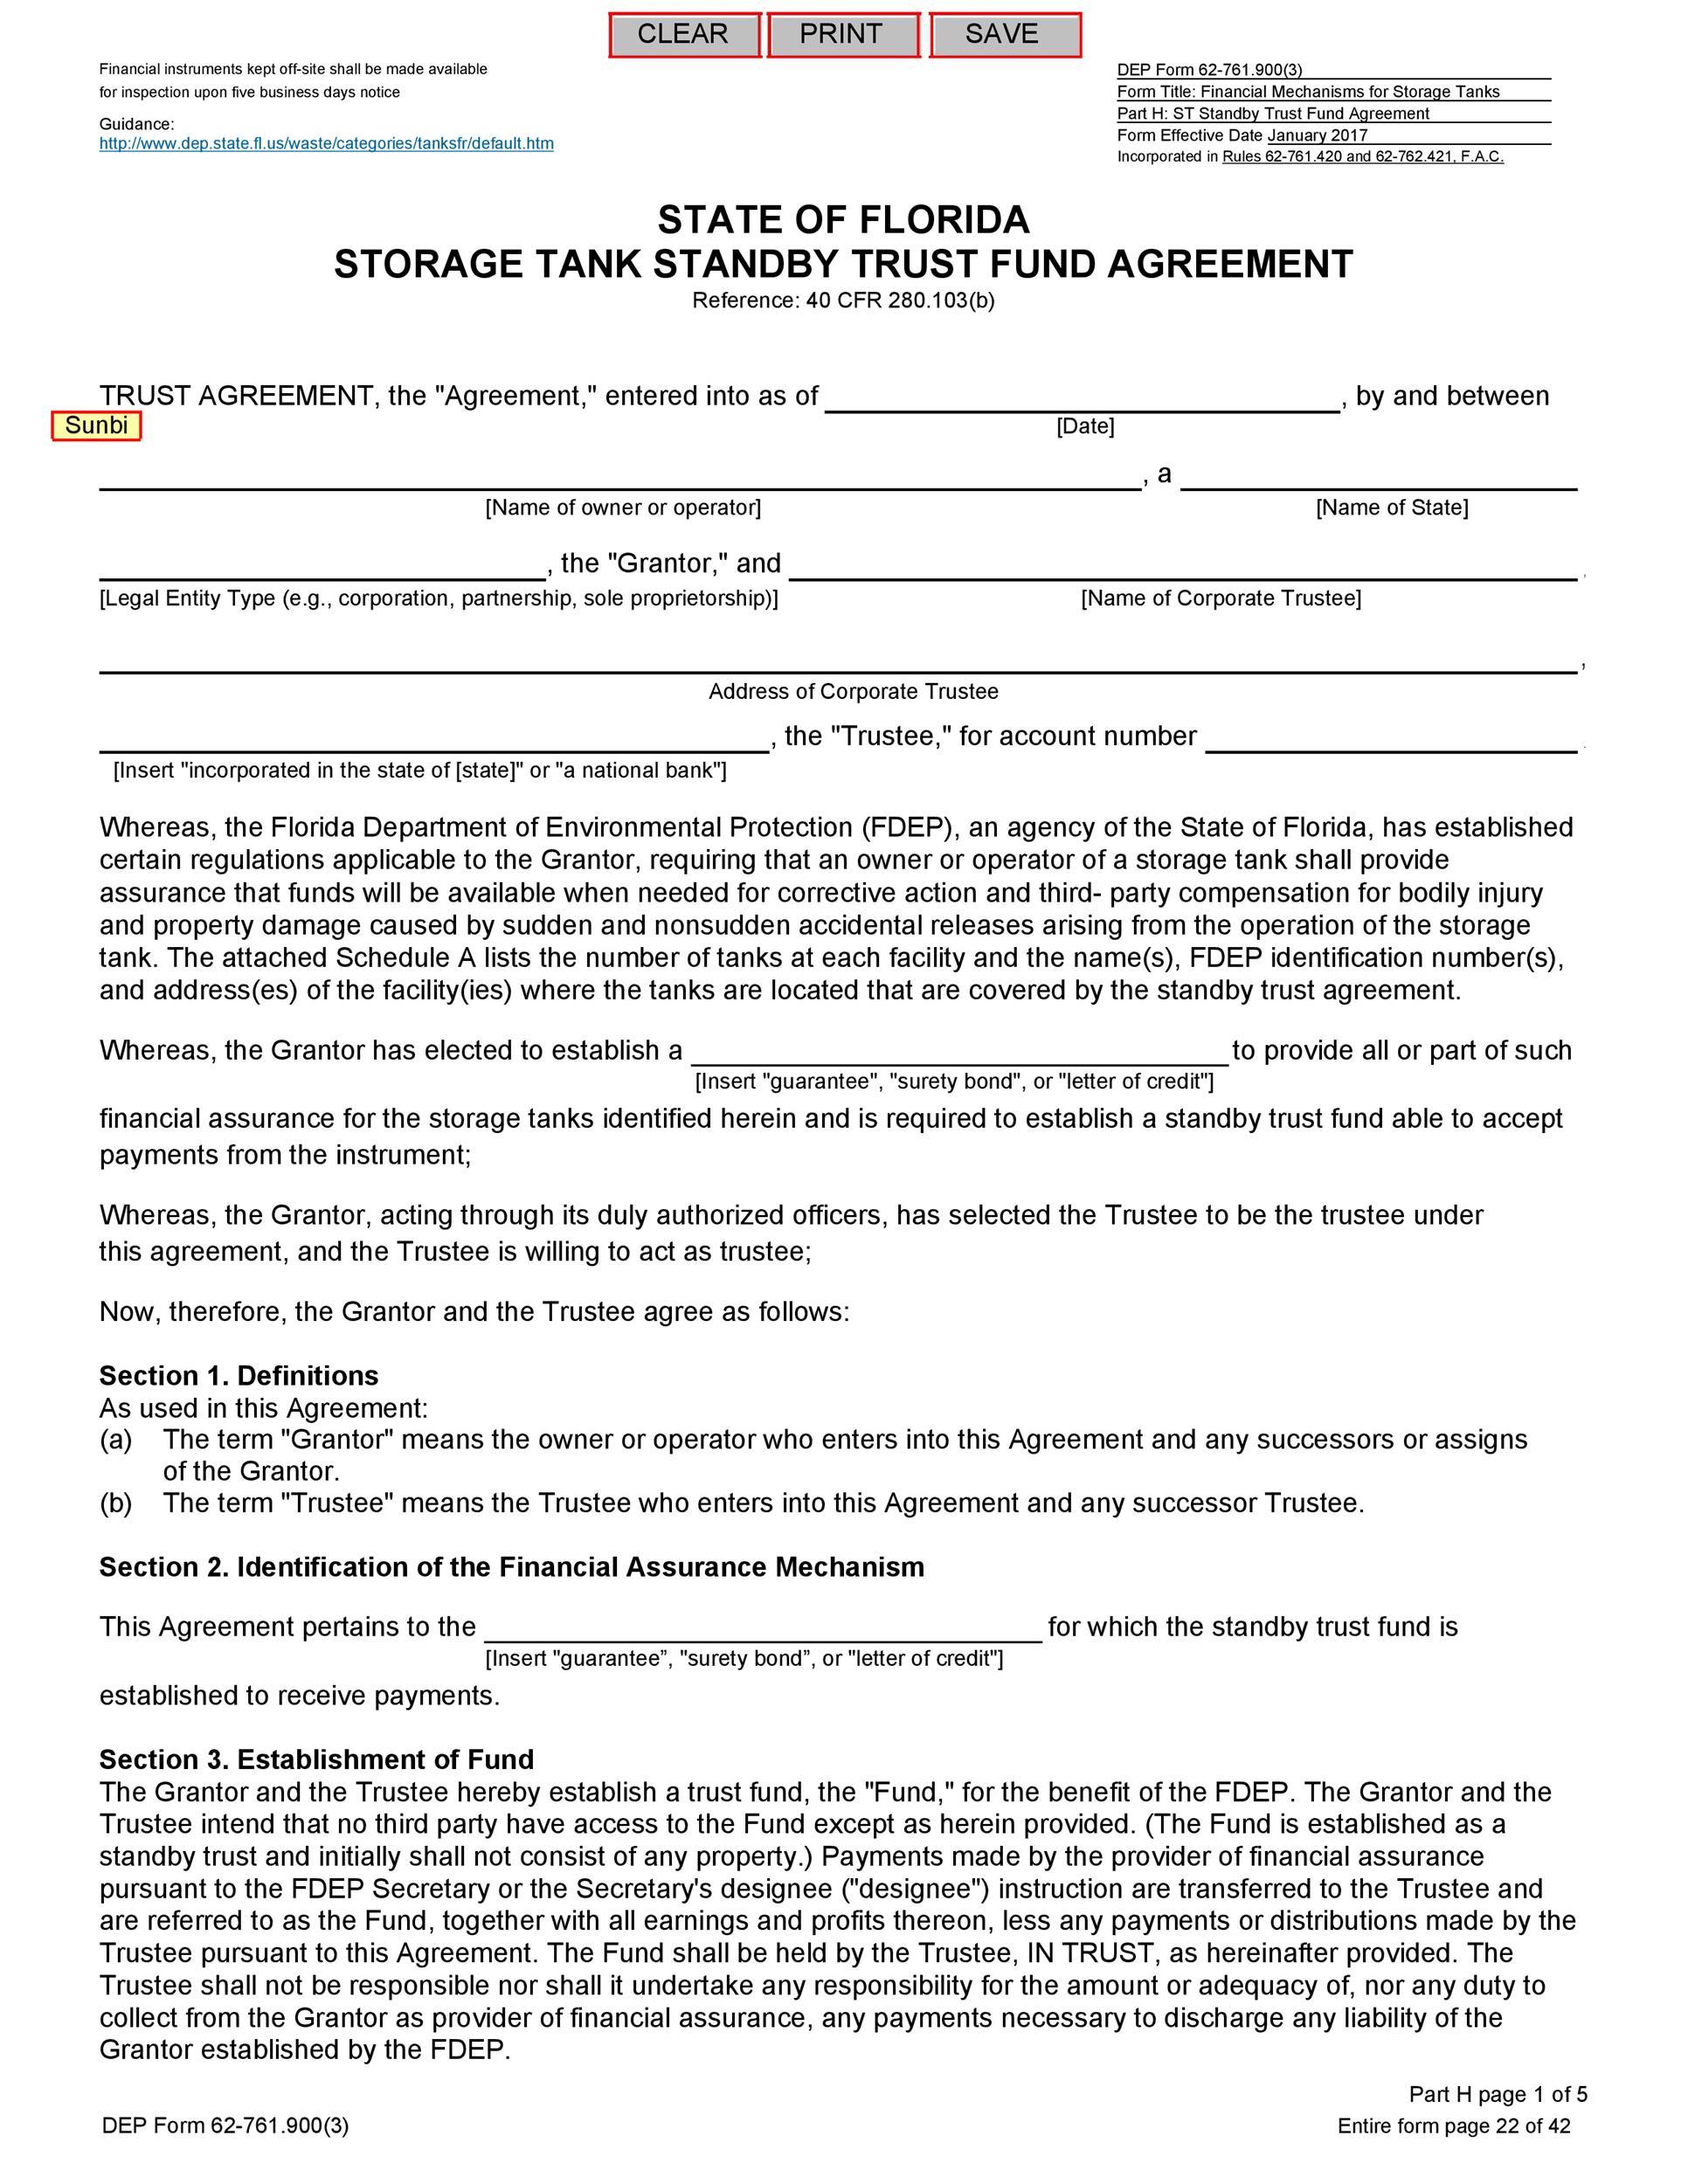 Free trust agreement 32